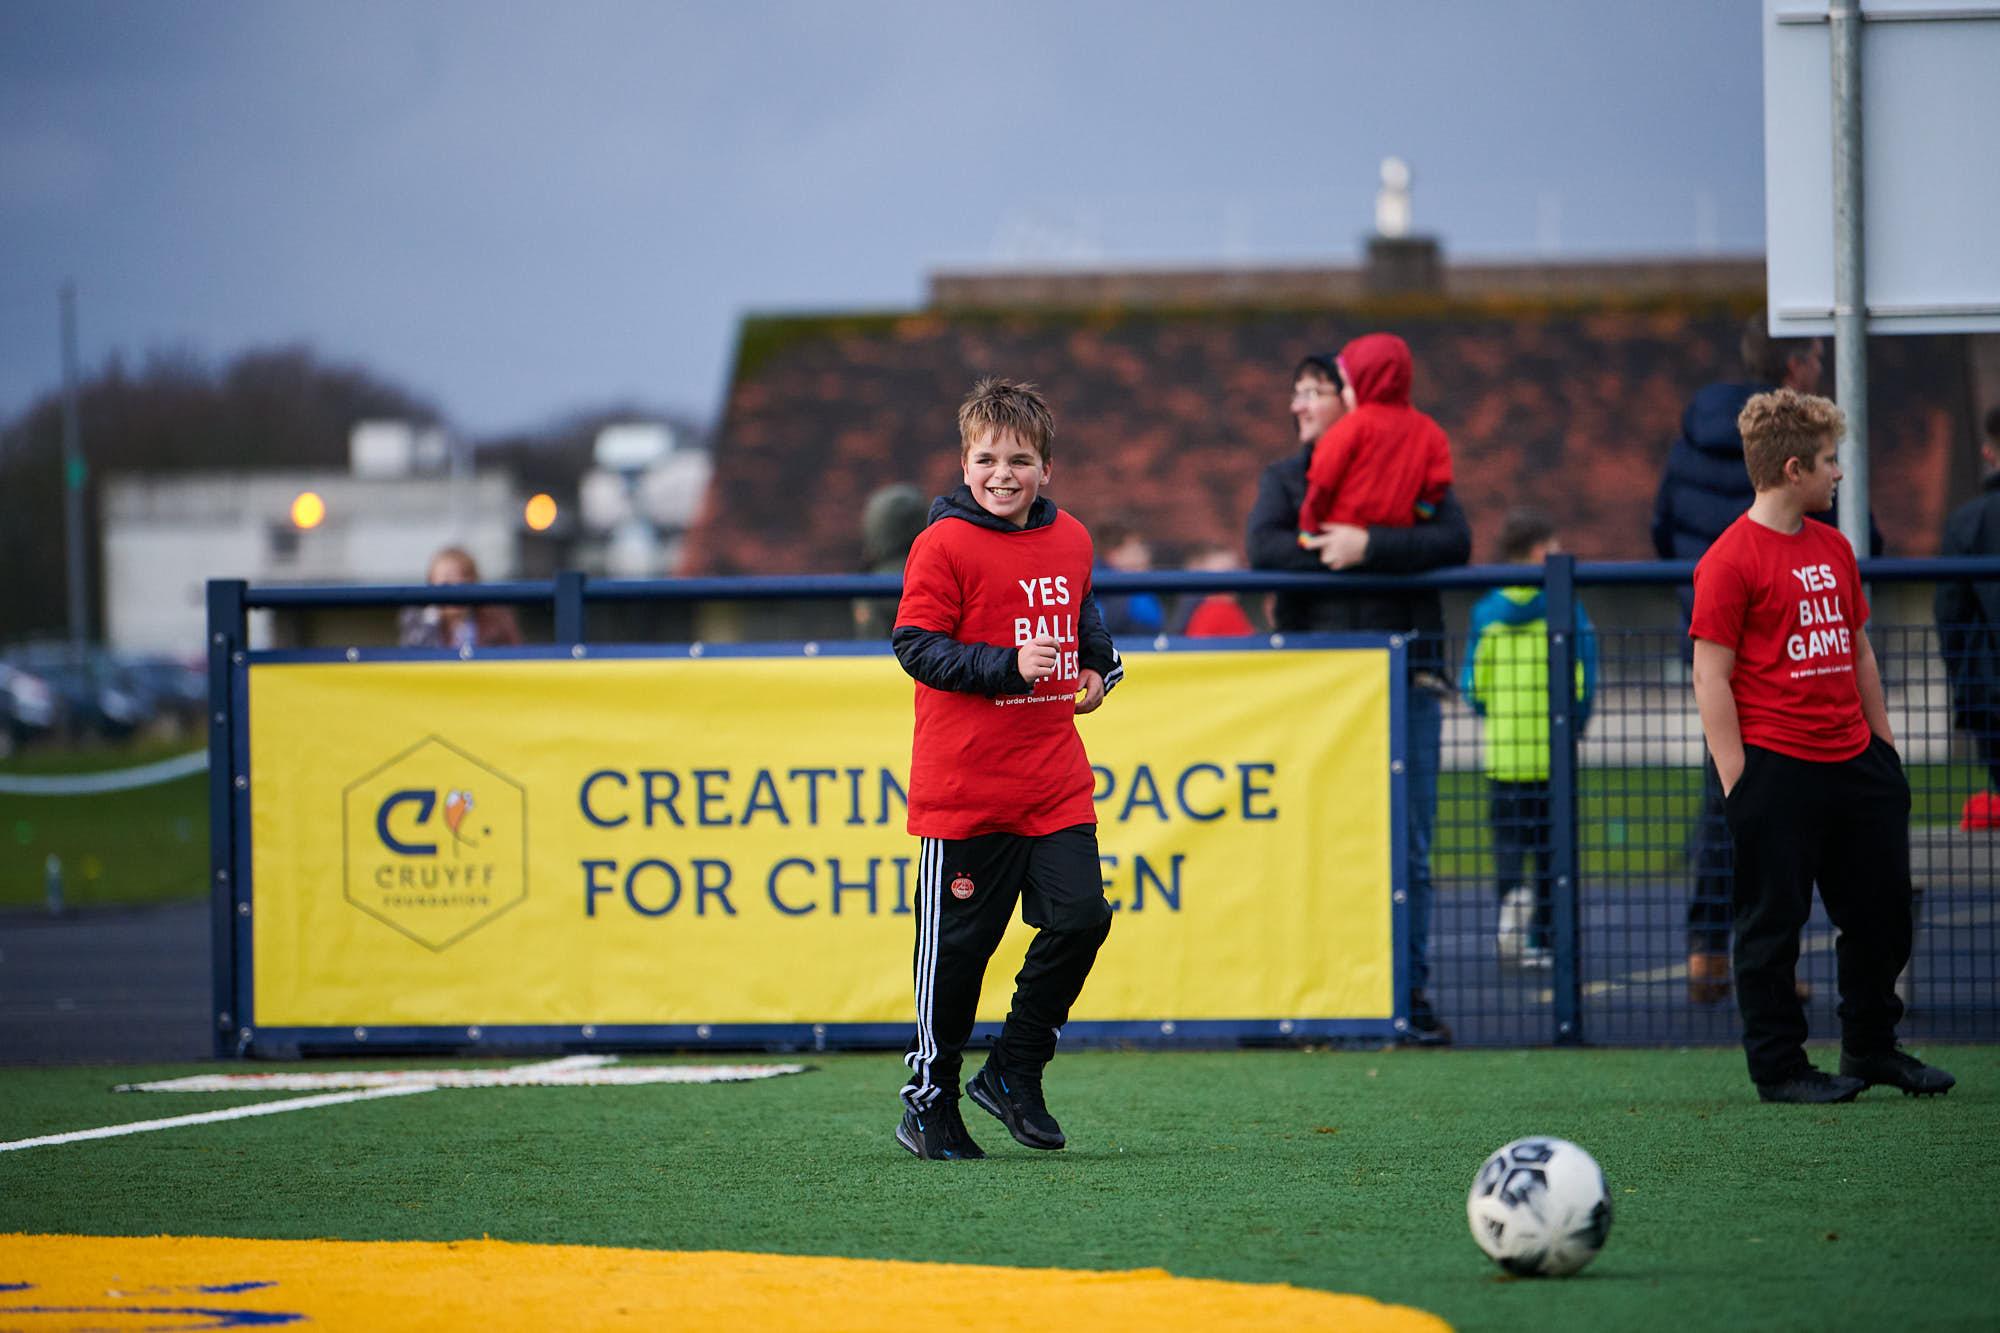 Children playing football on a Cruyff Court